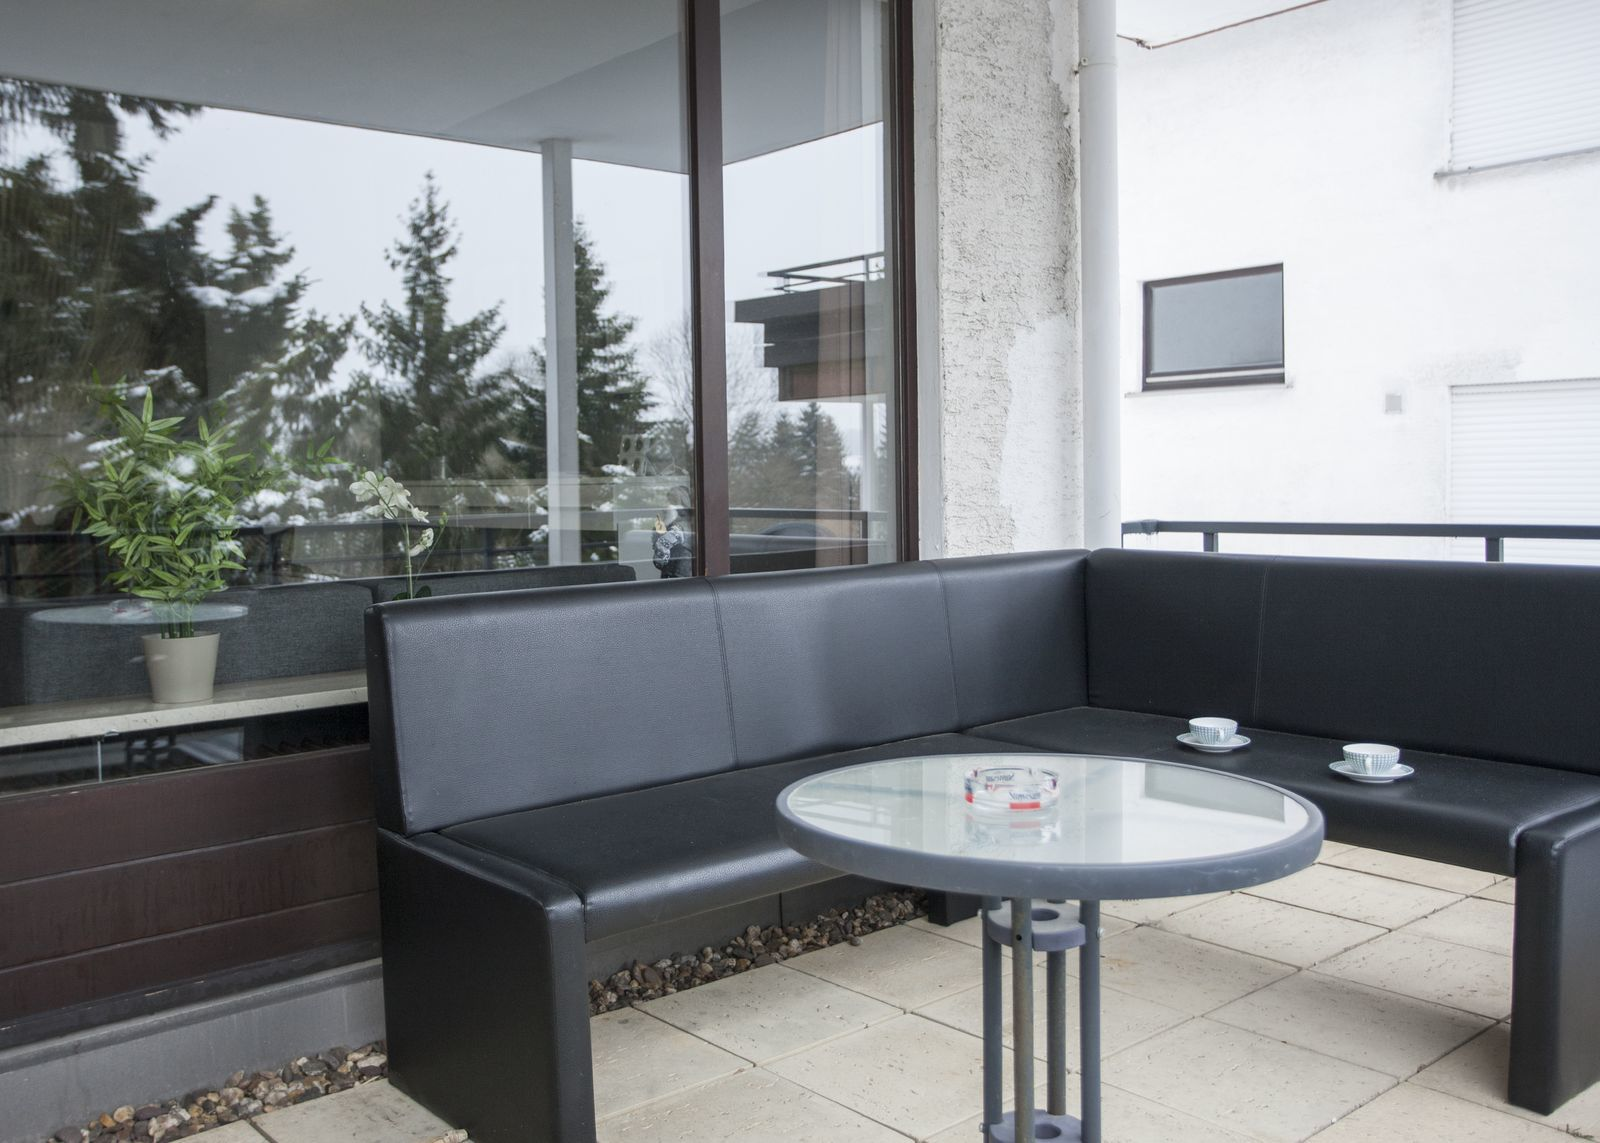 Apartment - Am Waltenberg 59-N